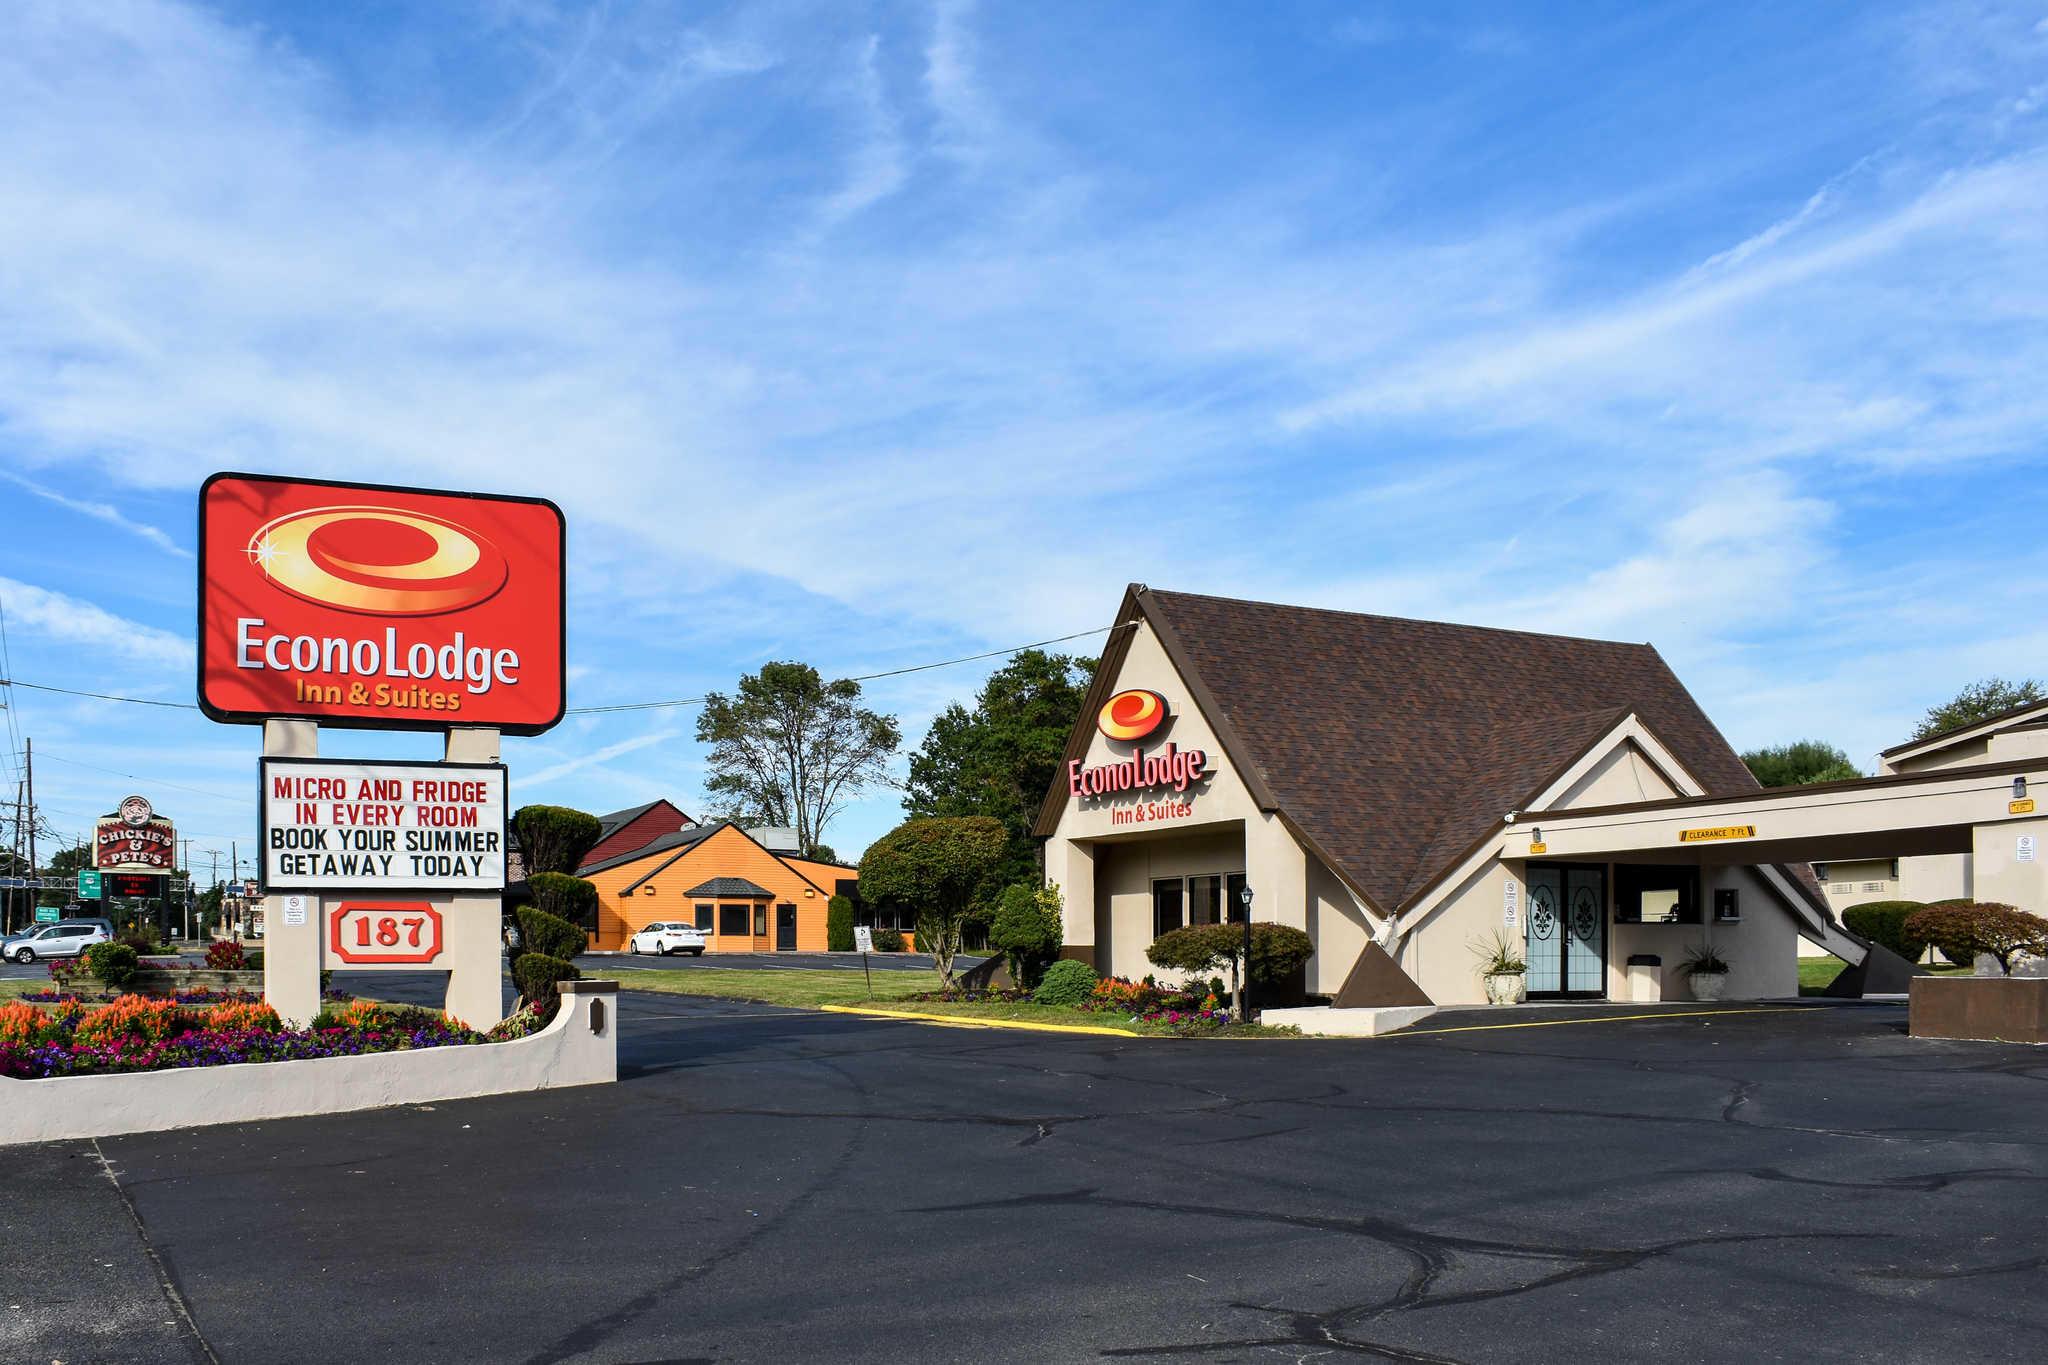 Econo Lodge Inn & Suites - Closed image 1